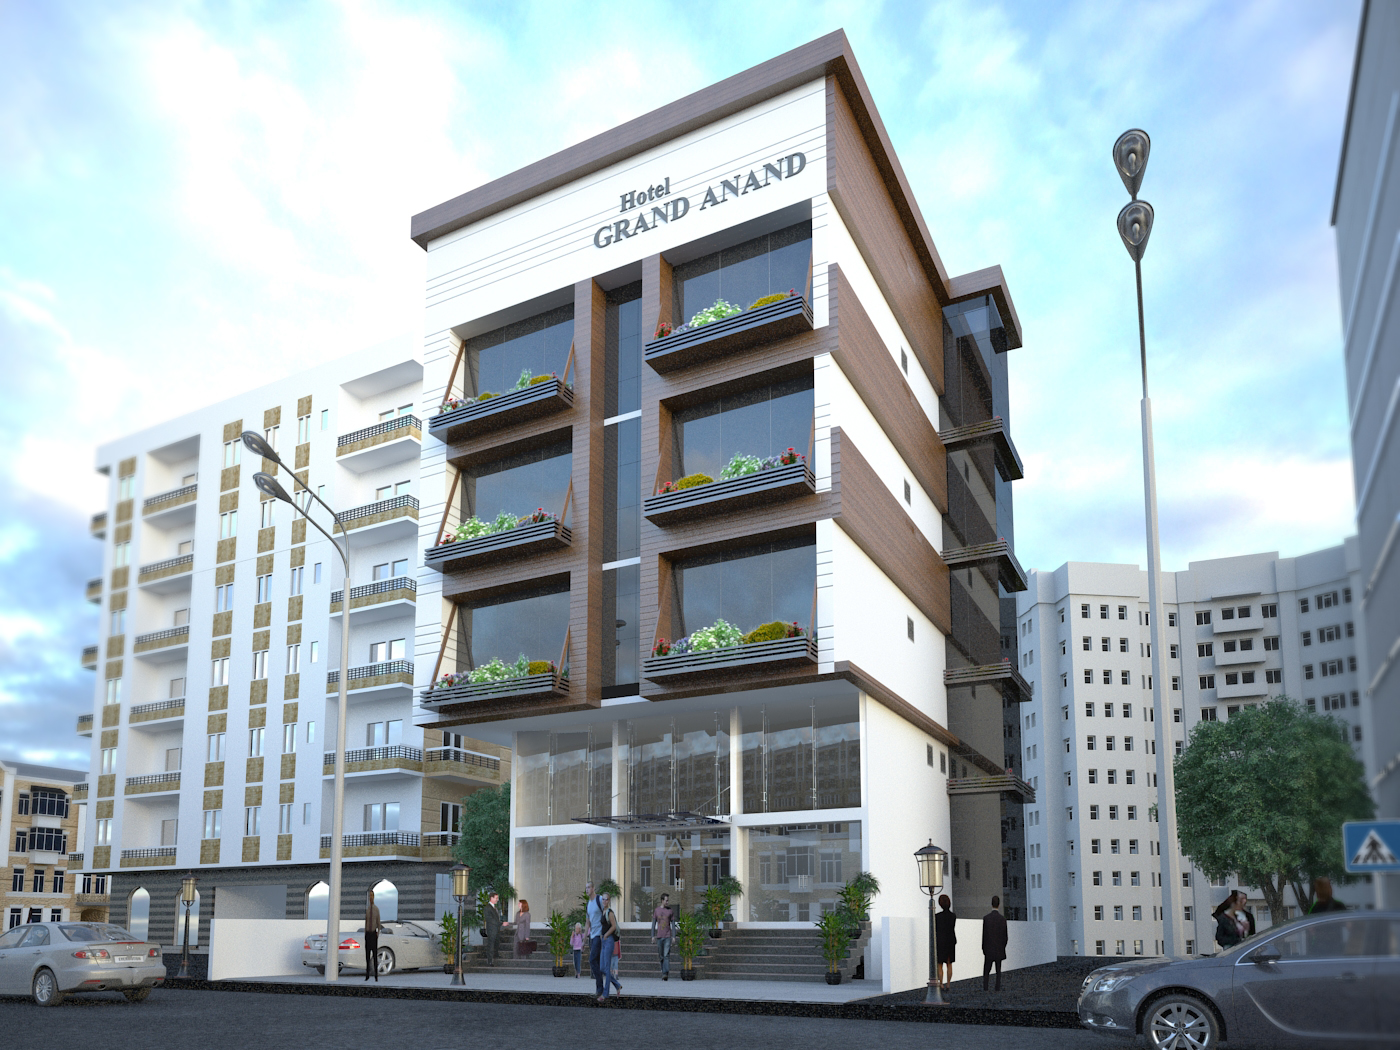 Hotel Exterior: Hotel Grand Anand Exterior Design